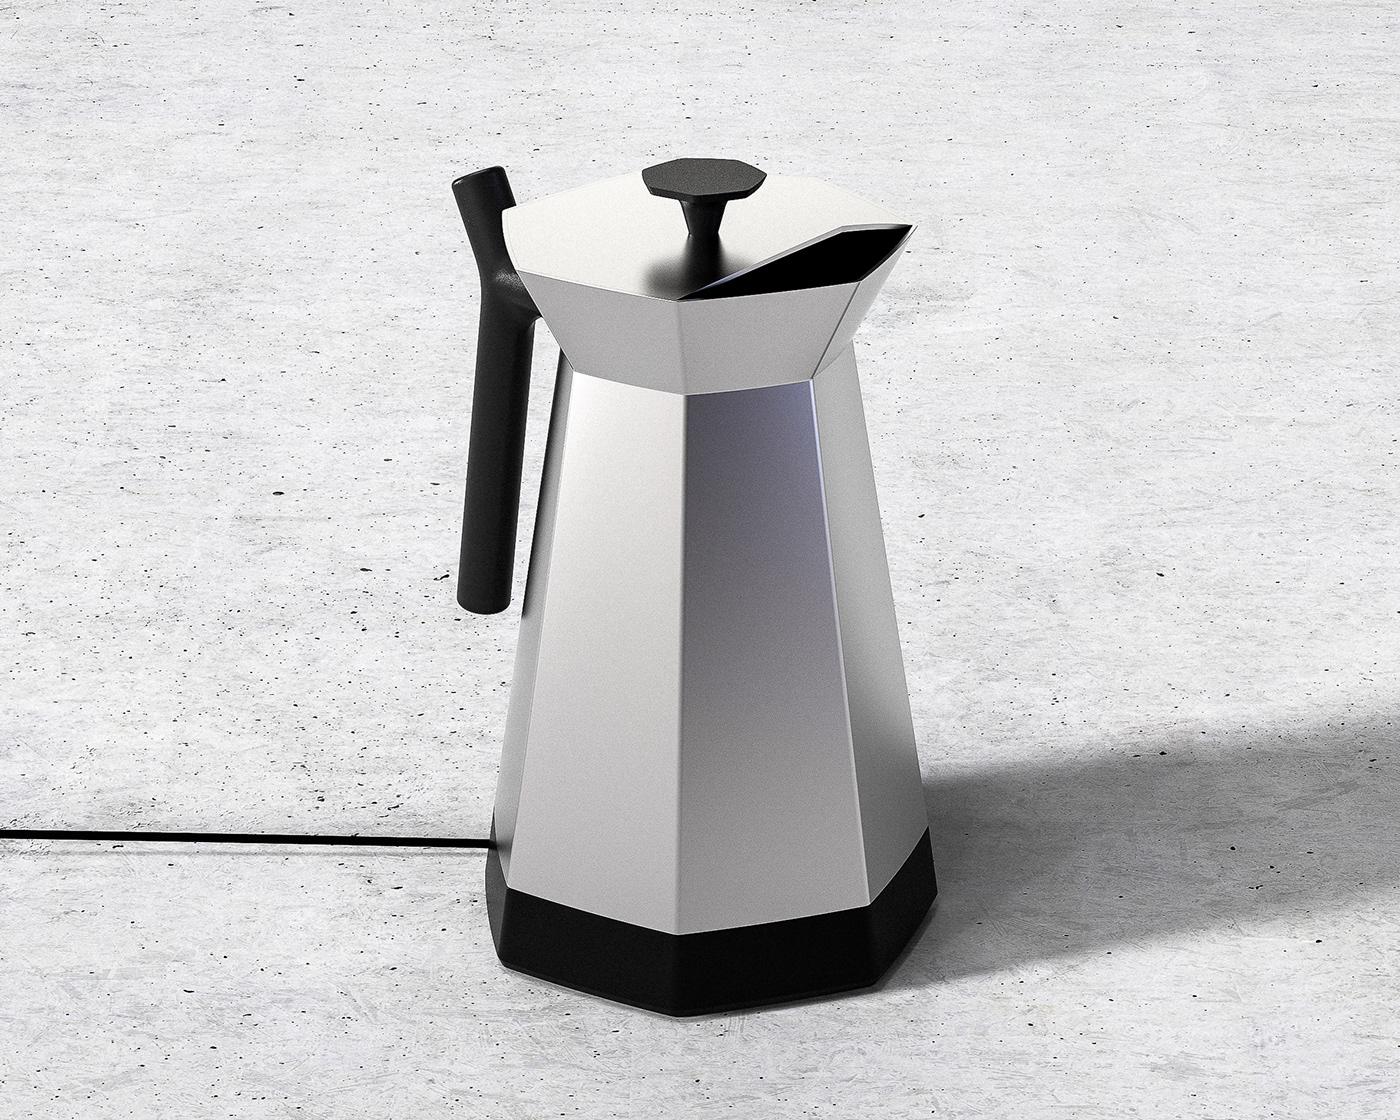 Applience   AR chris chris ference industrial design  kettle design paper modeling Prototyping rendering vr